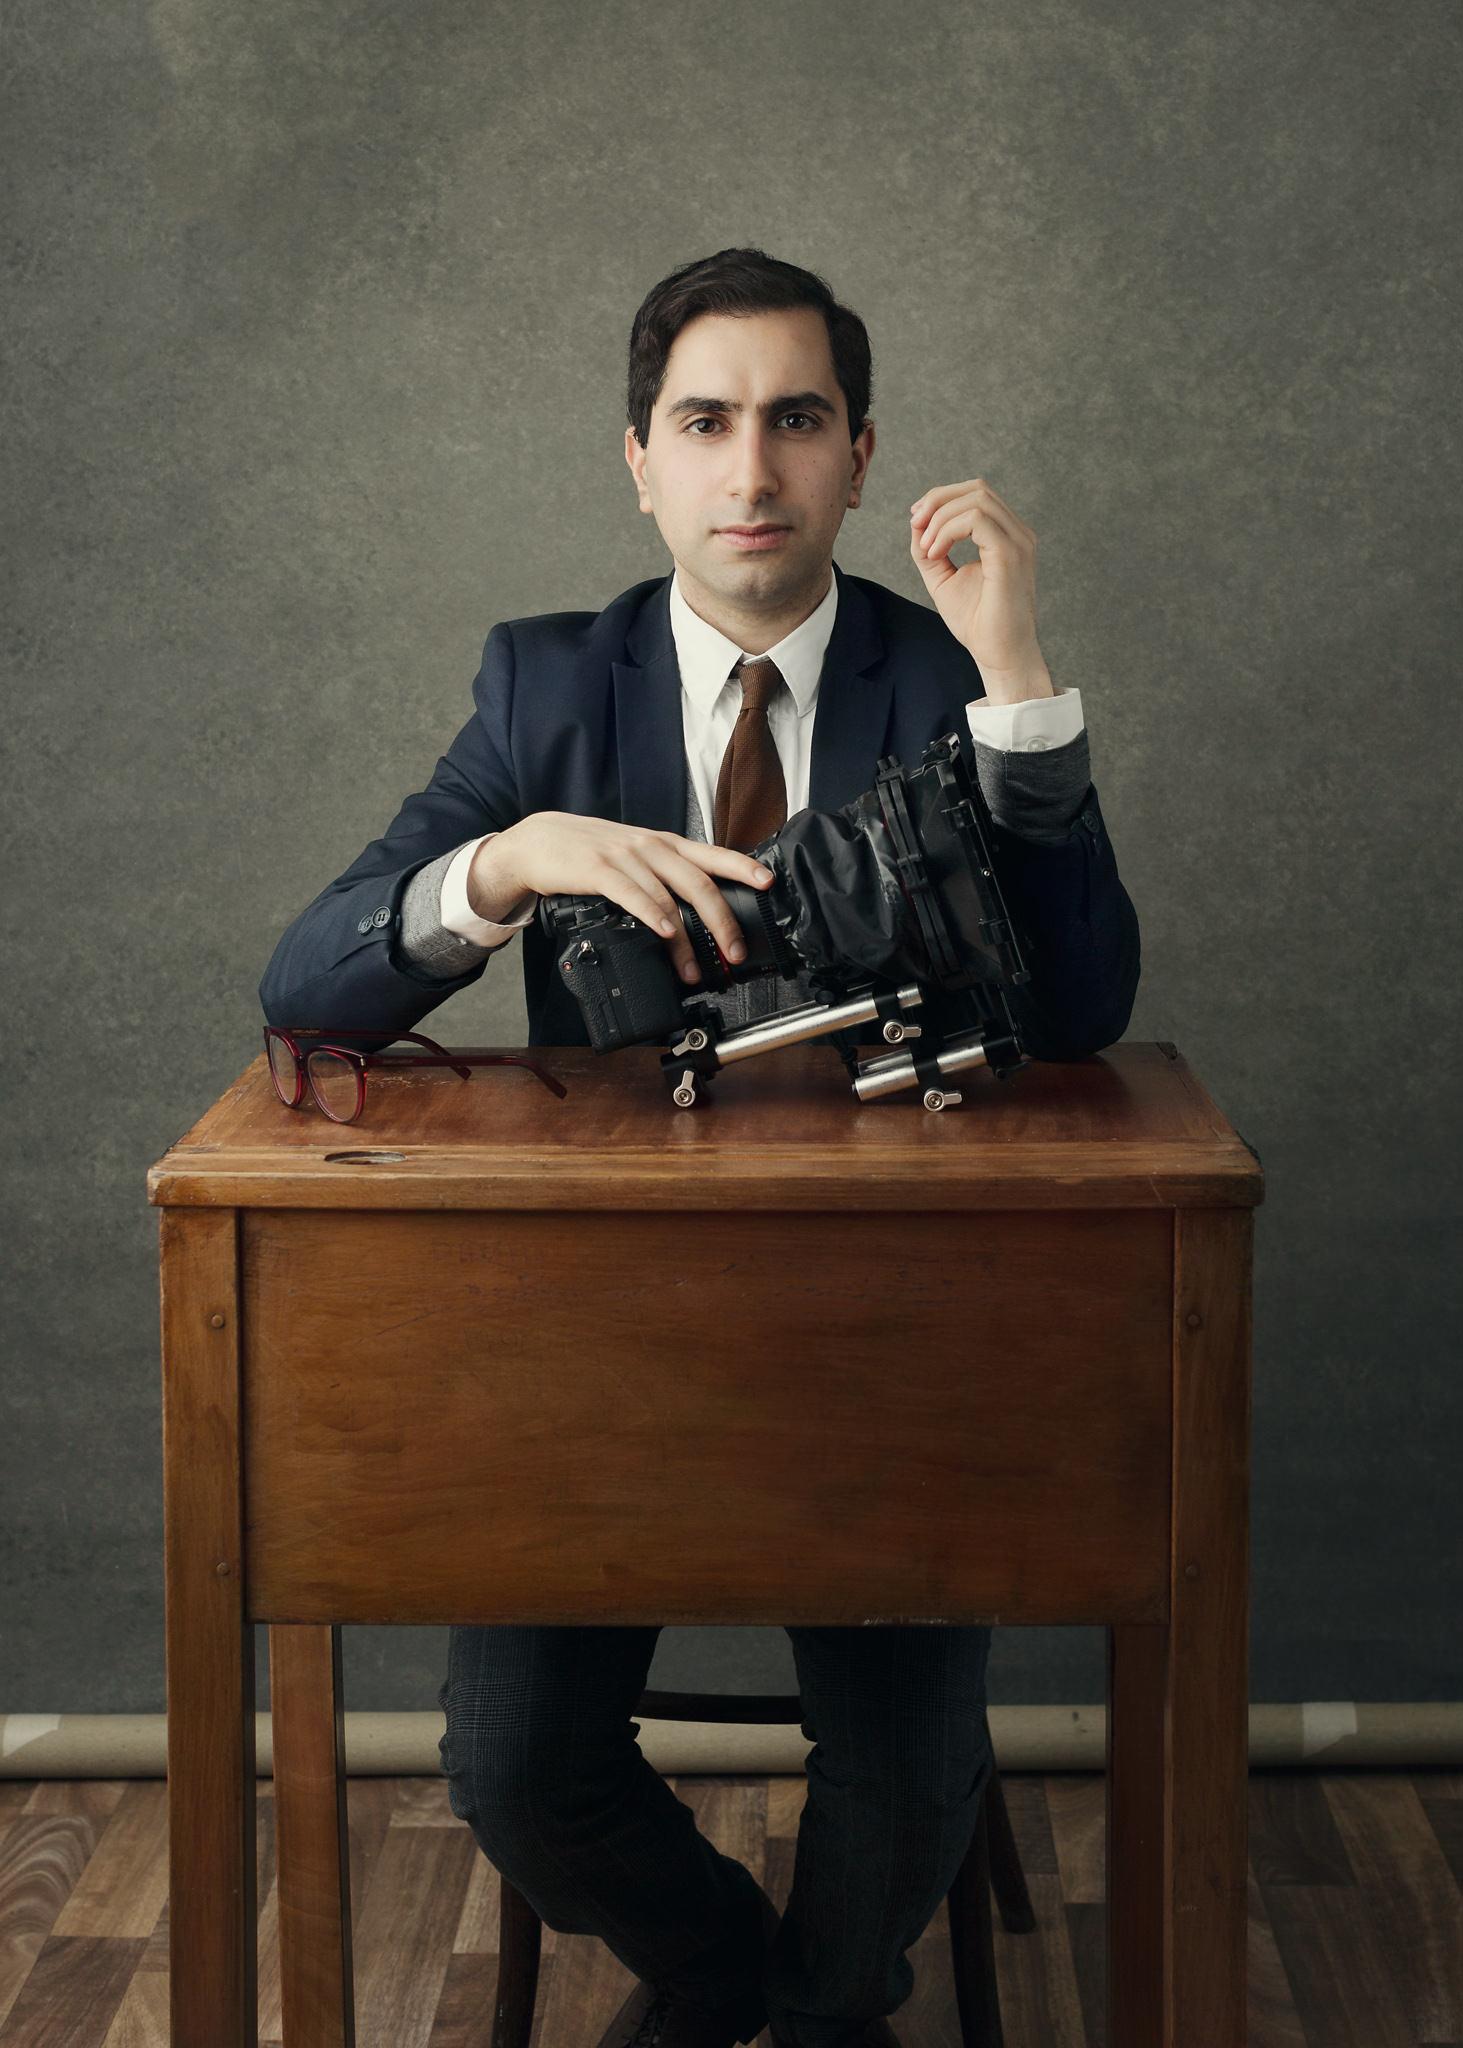 Editorial portrait photography UK